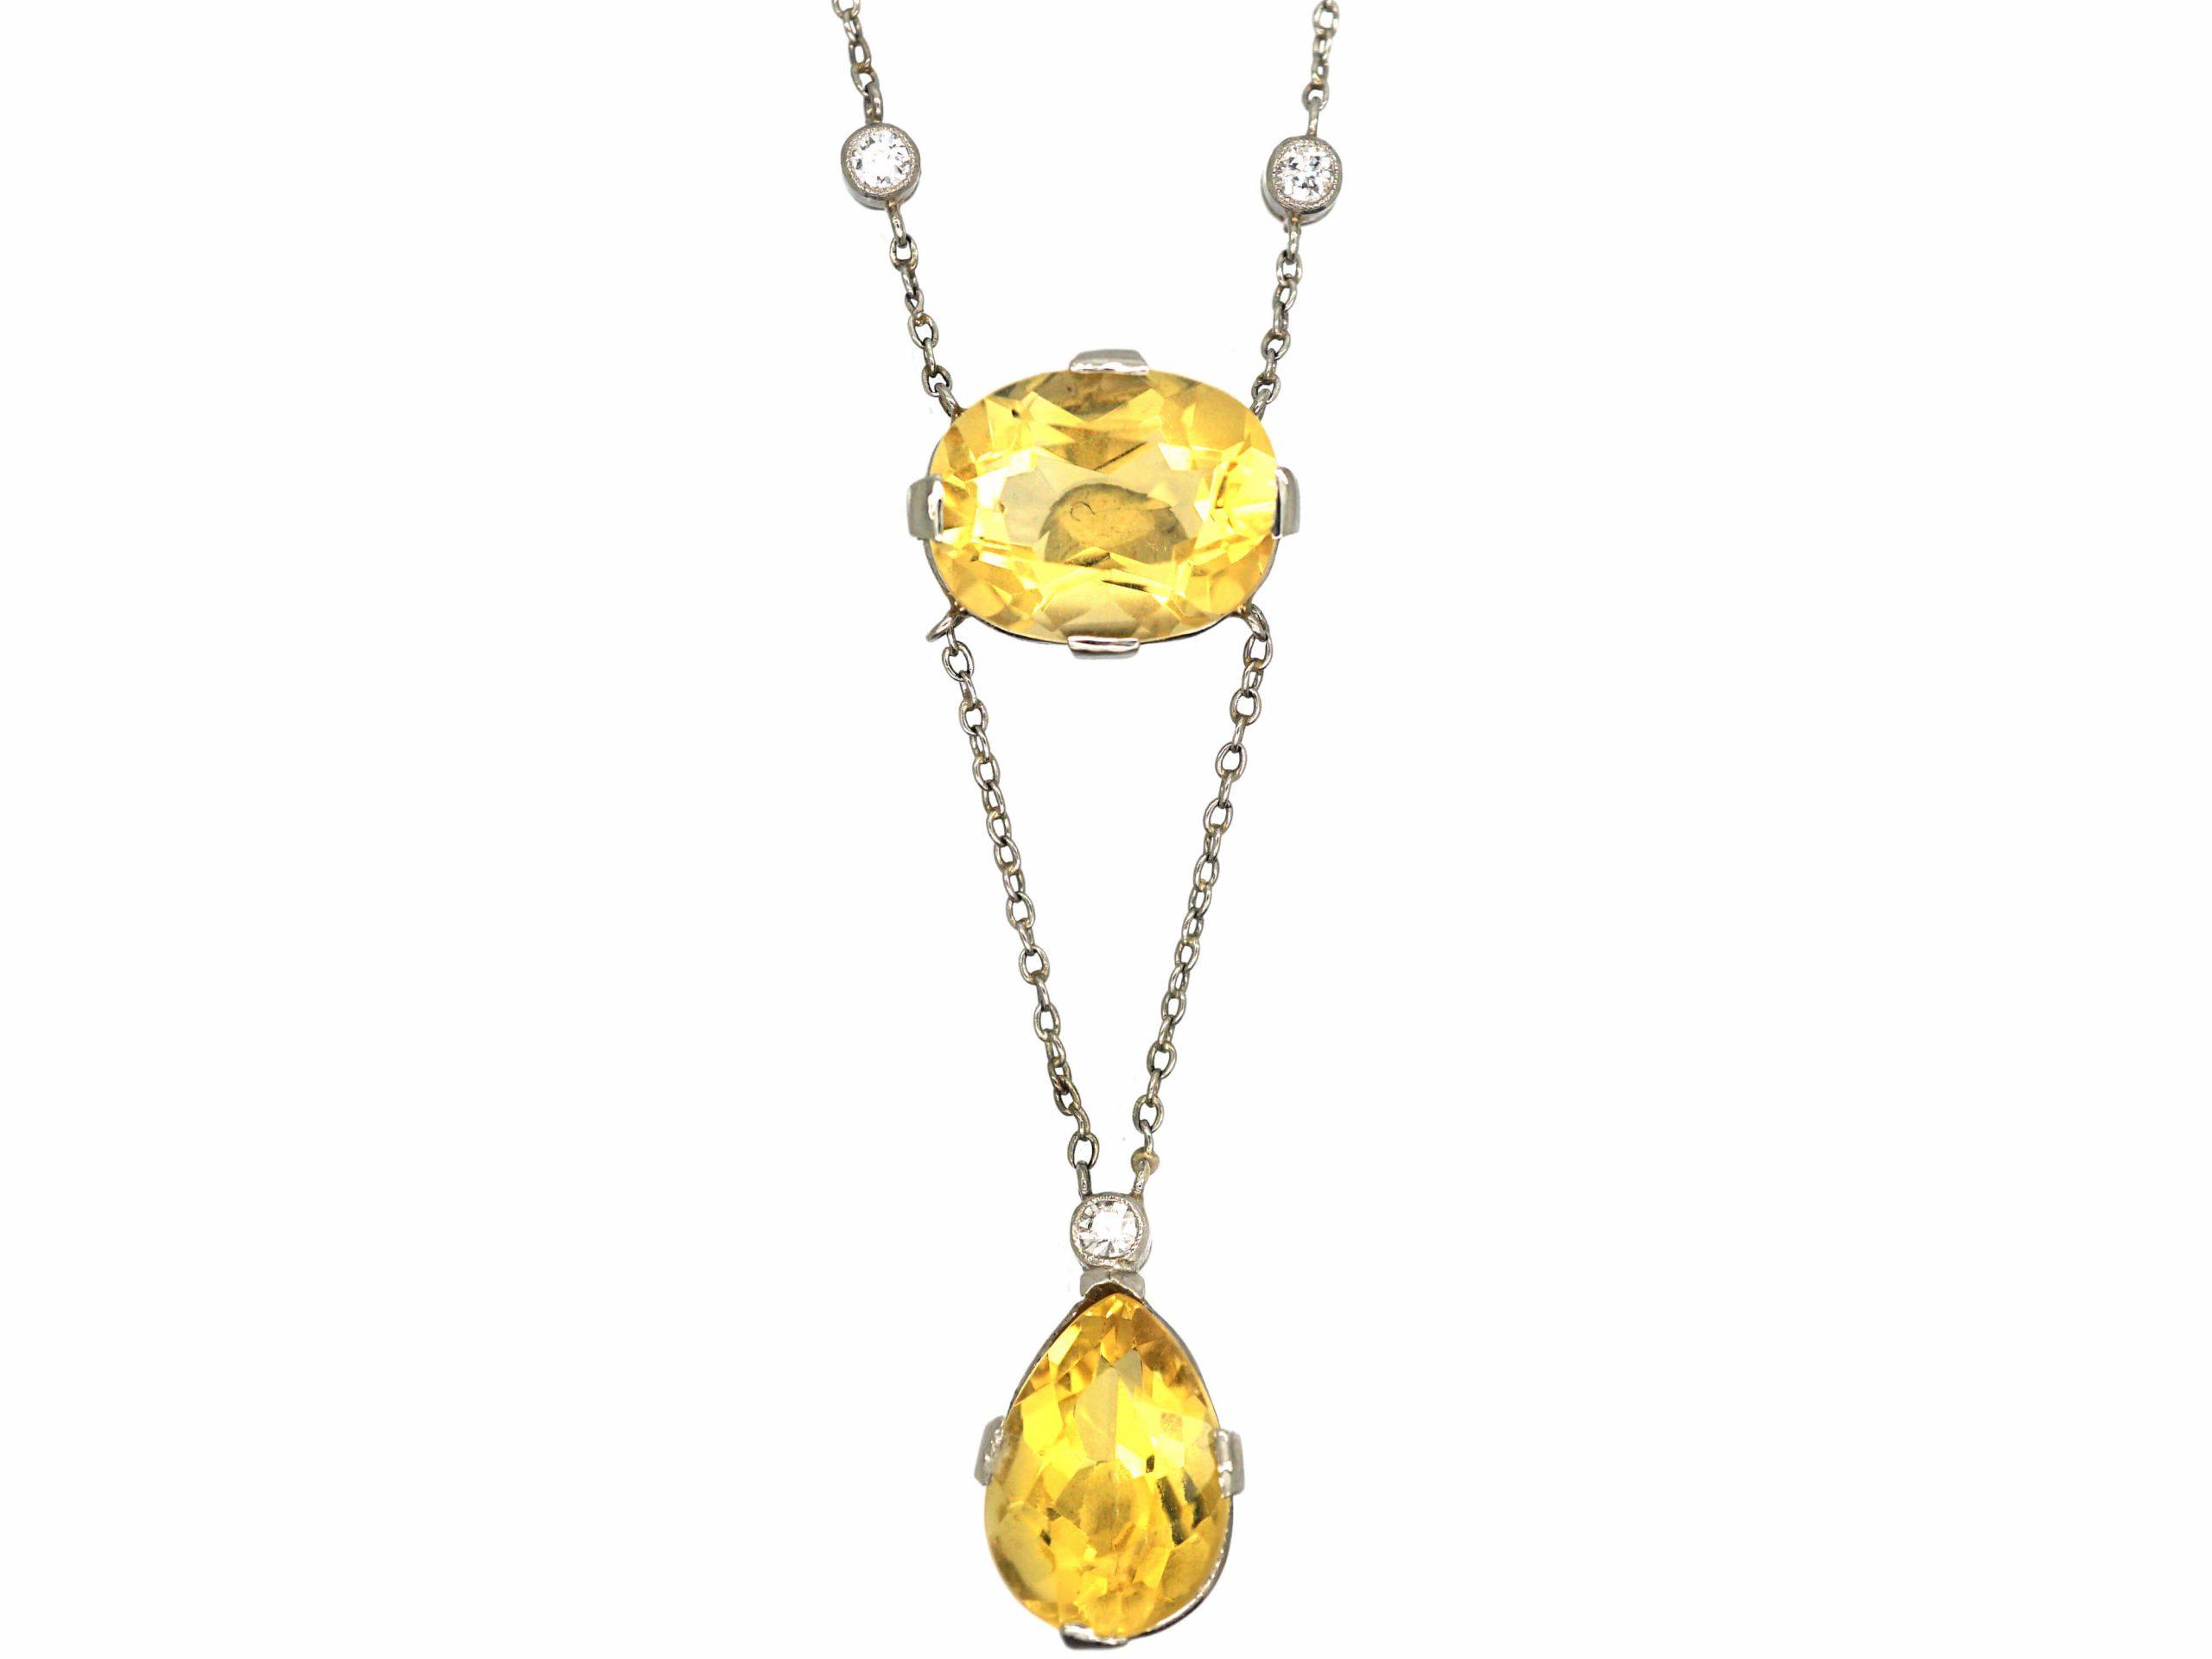 Edwardian 18ct White Gold, Citrine & Diamond Pendant on 18ct White Gold Chain